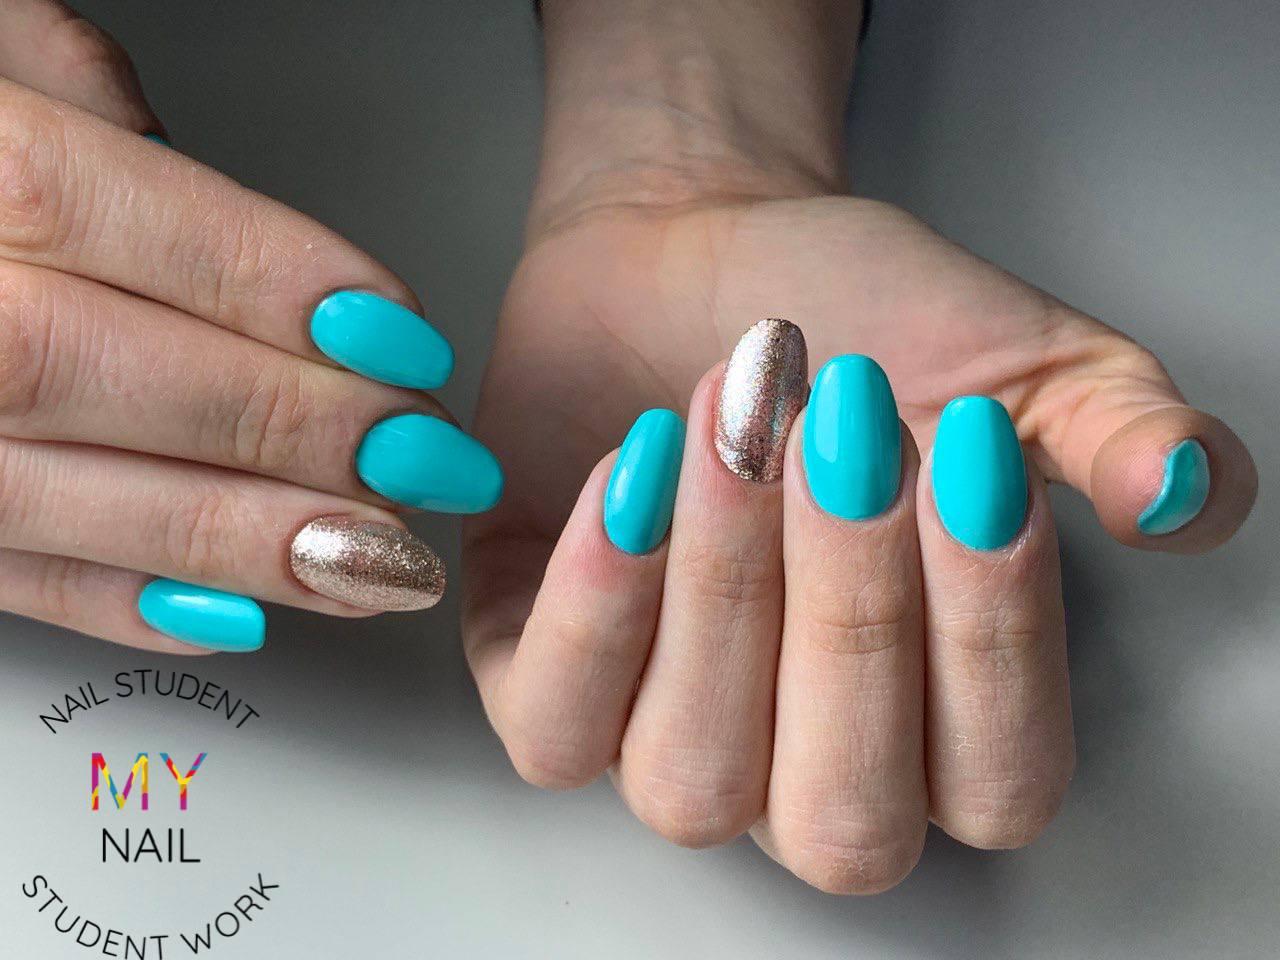 Lavoro allieva_nail student